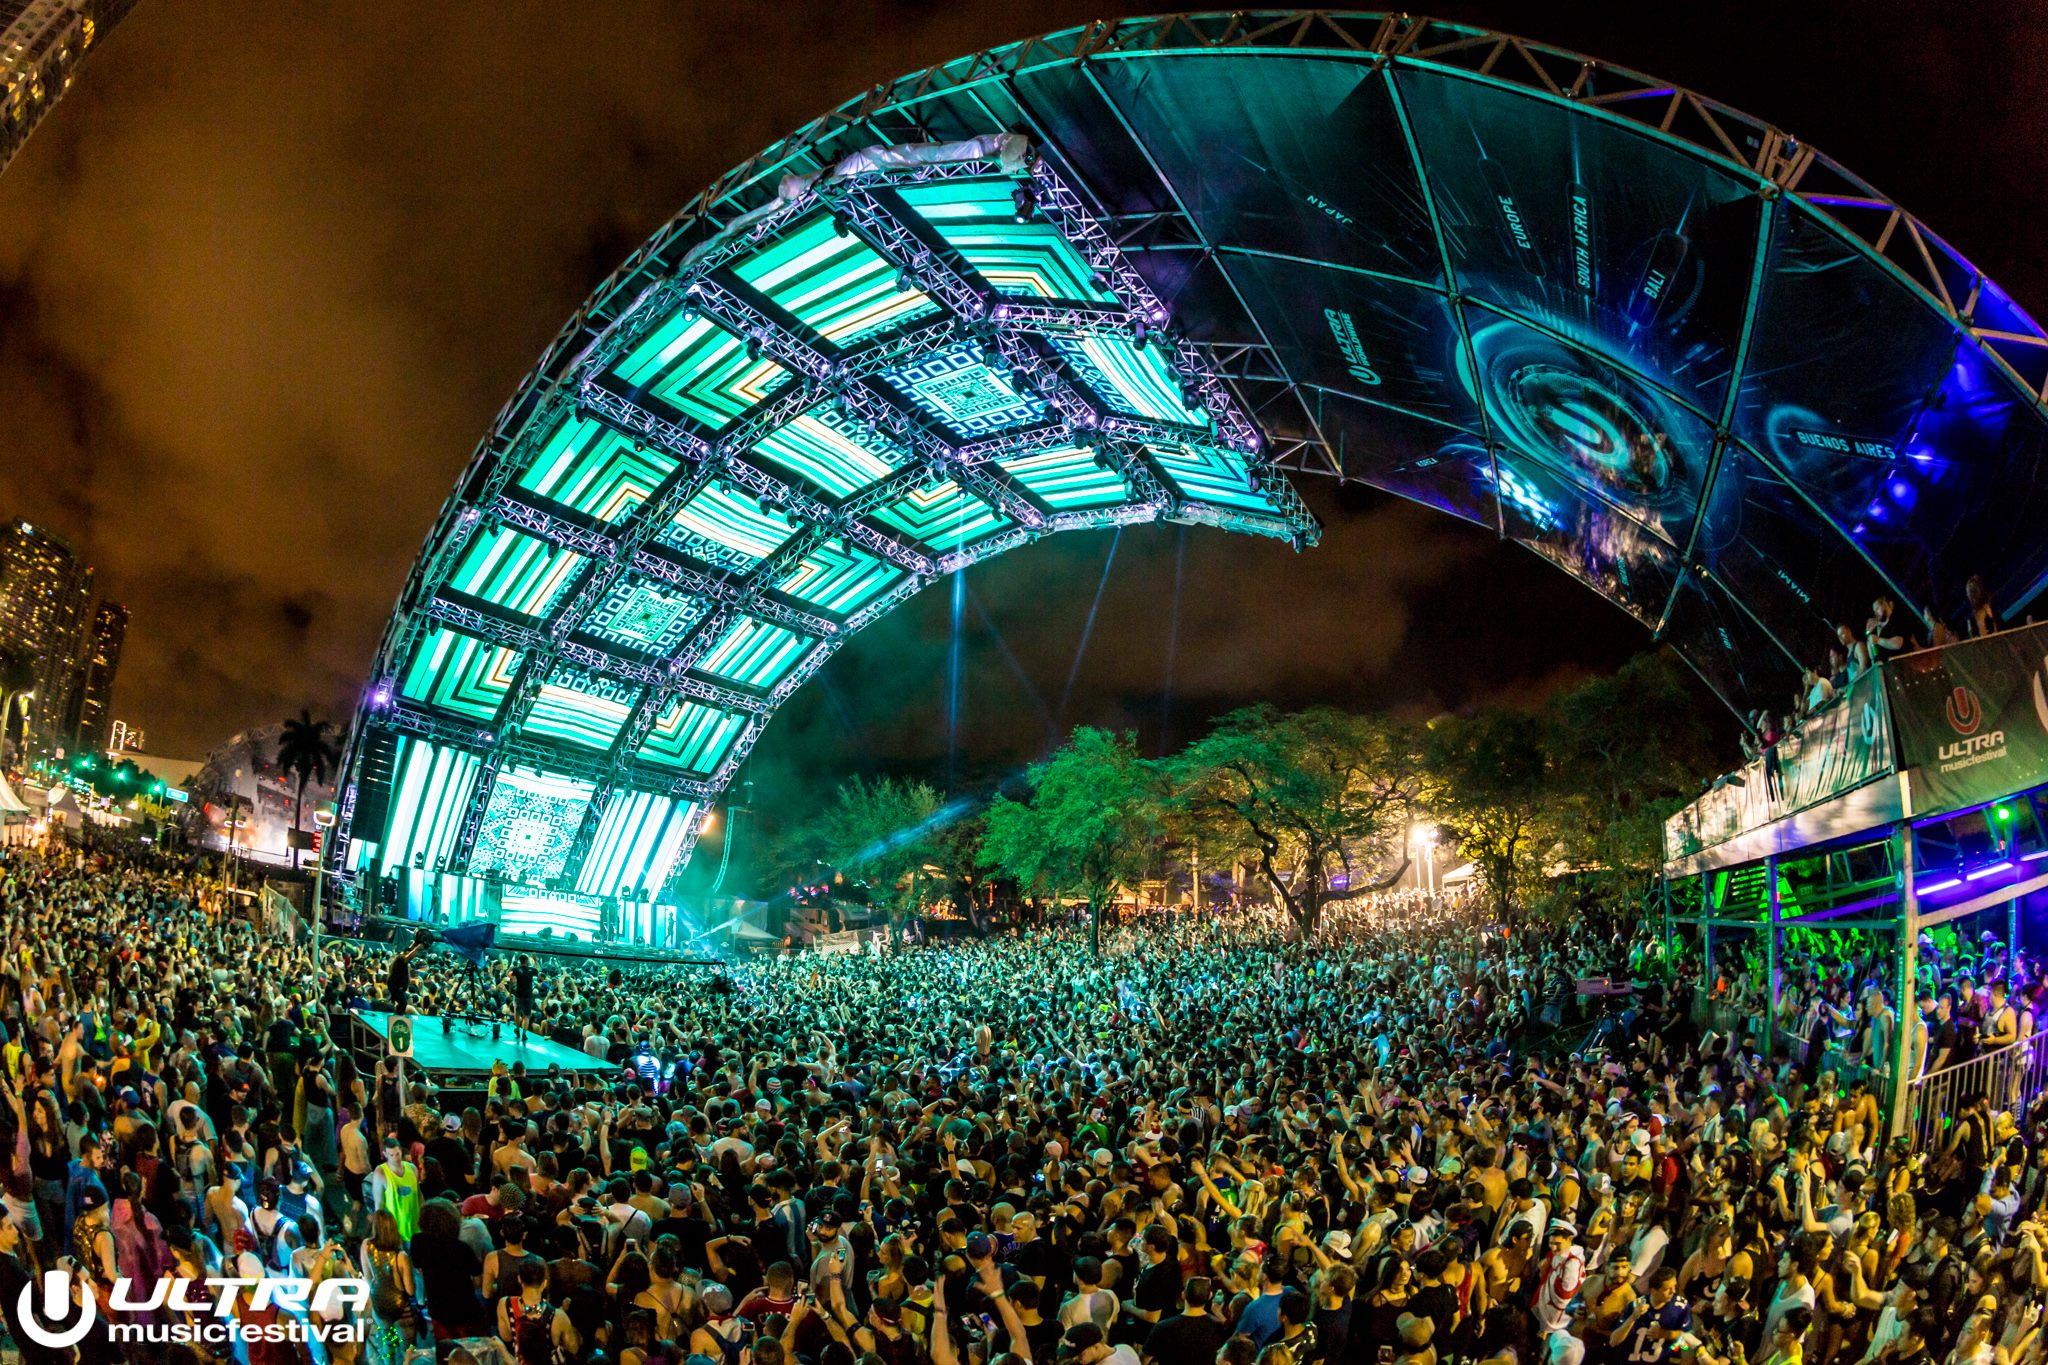 ULTRA MUSIC FESTIVAL 2017 PIC1